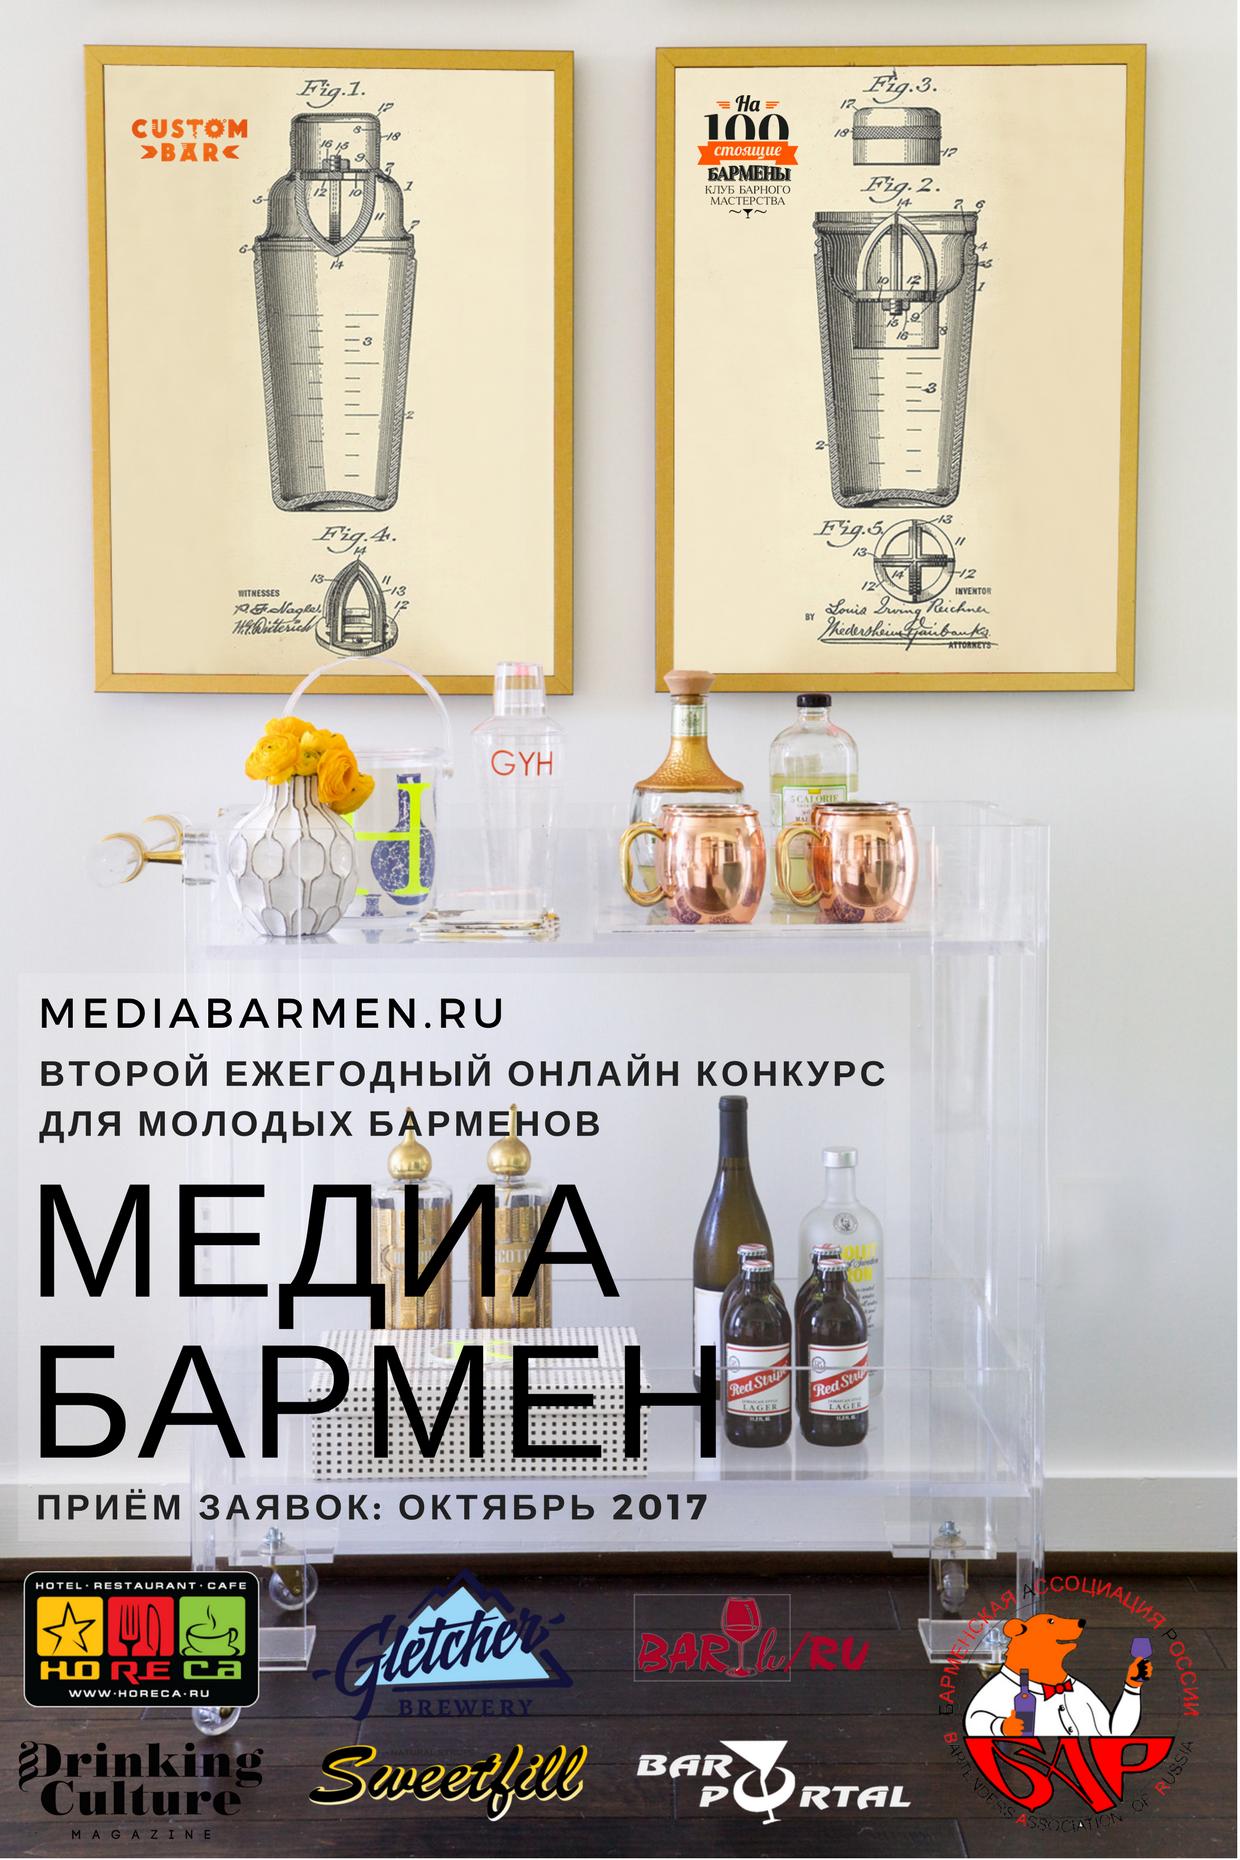 МедиаБармен медиа бармен 2017 афиша постер патент барный инвентарь барная тележка barcart bar cart плакат бокал бутылка